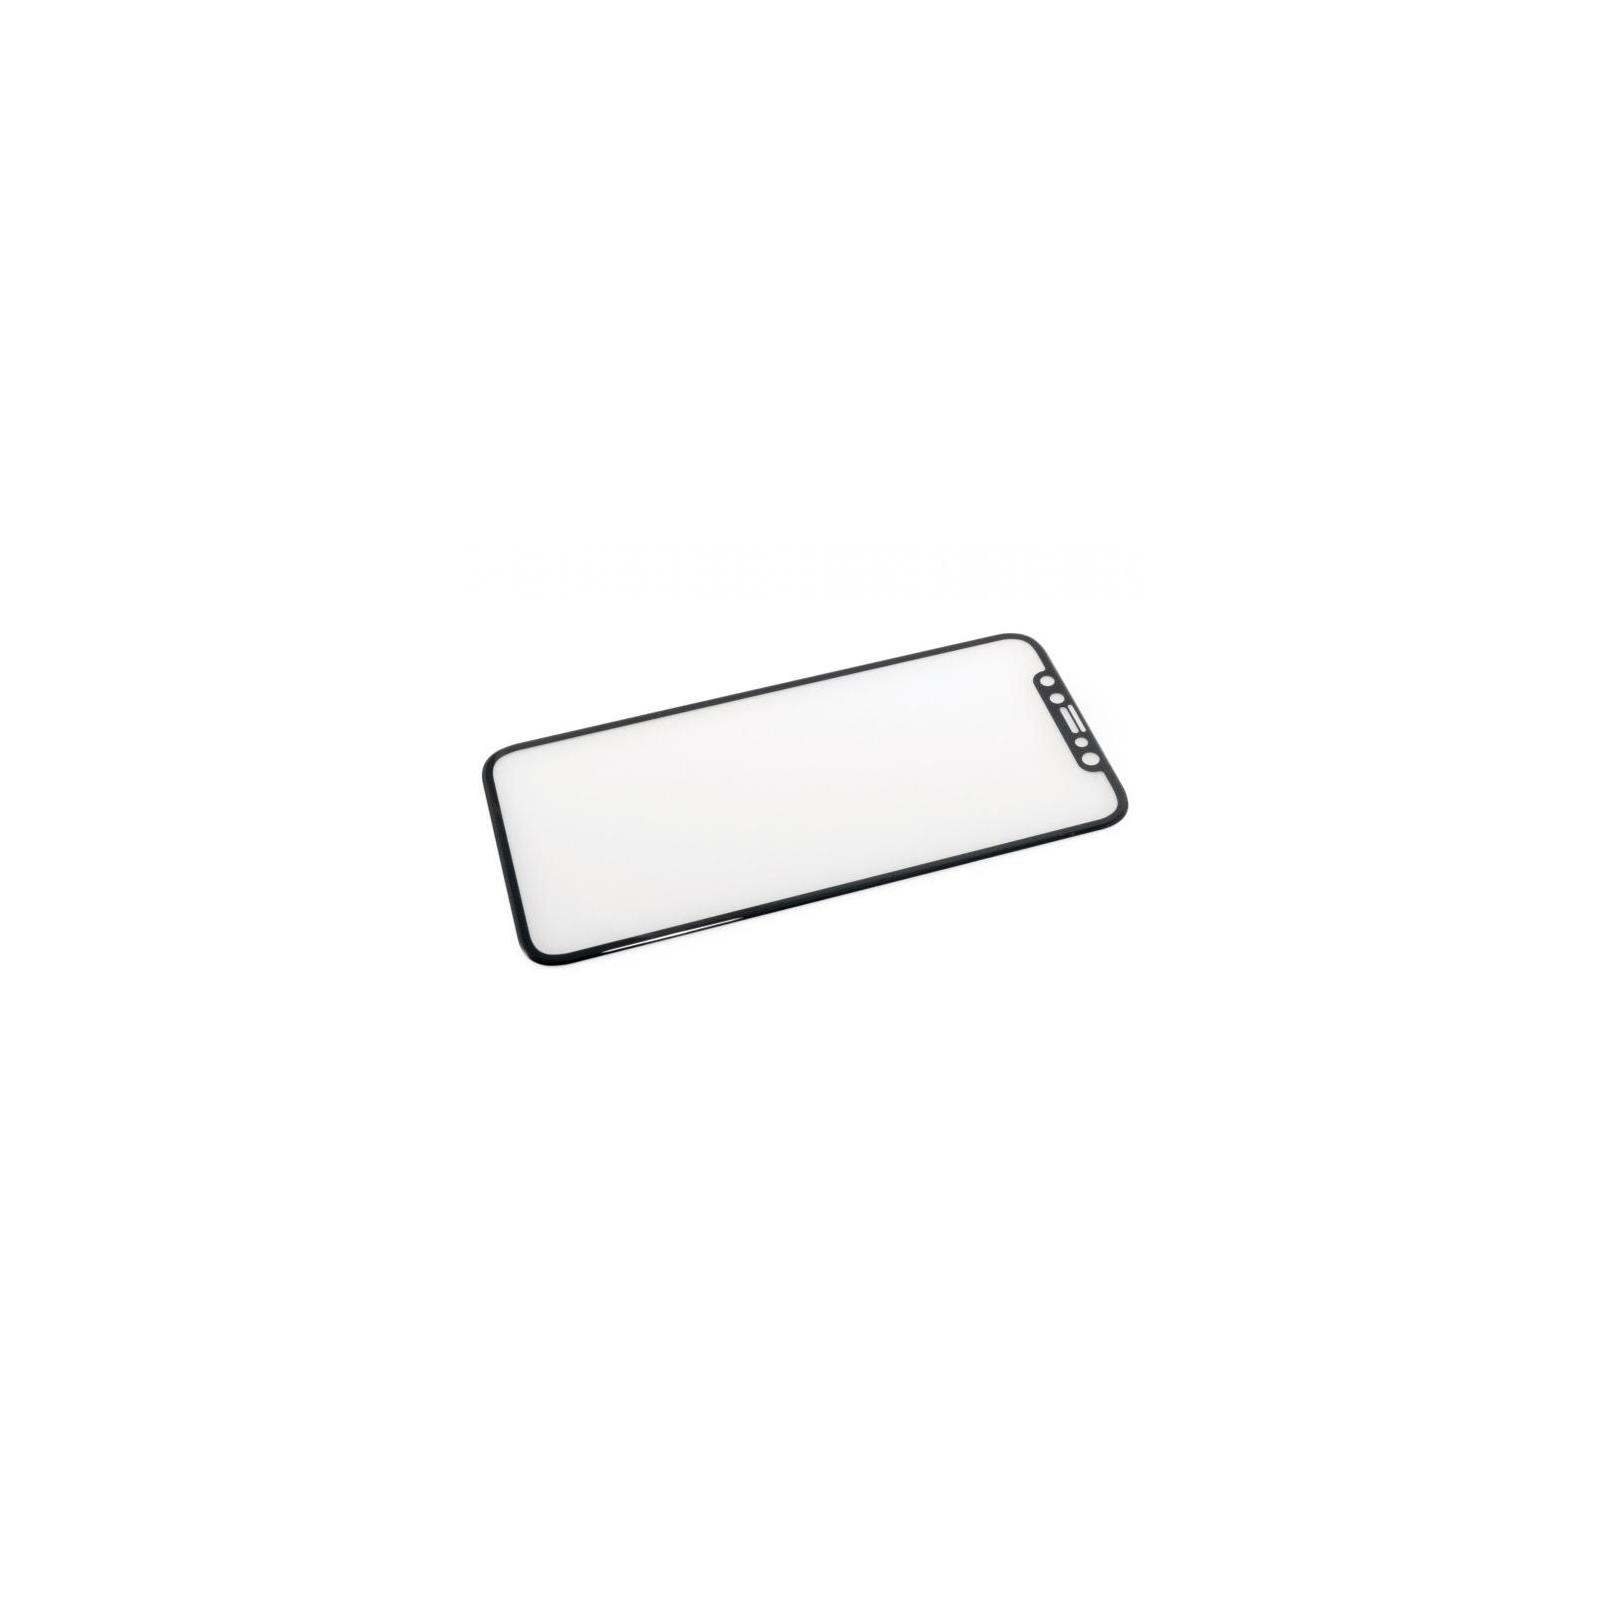 Стекло защитное iSG для Apple iPhone X 3D Full Cover Black (SPG4407) изображение 2